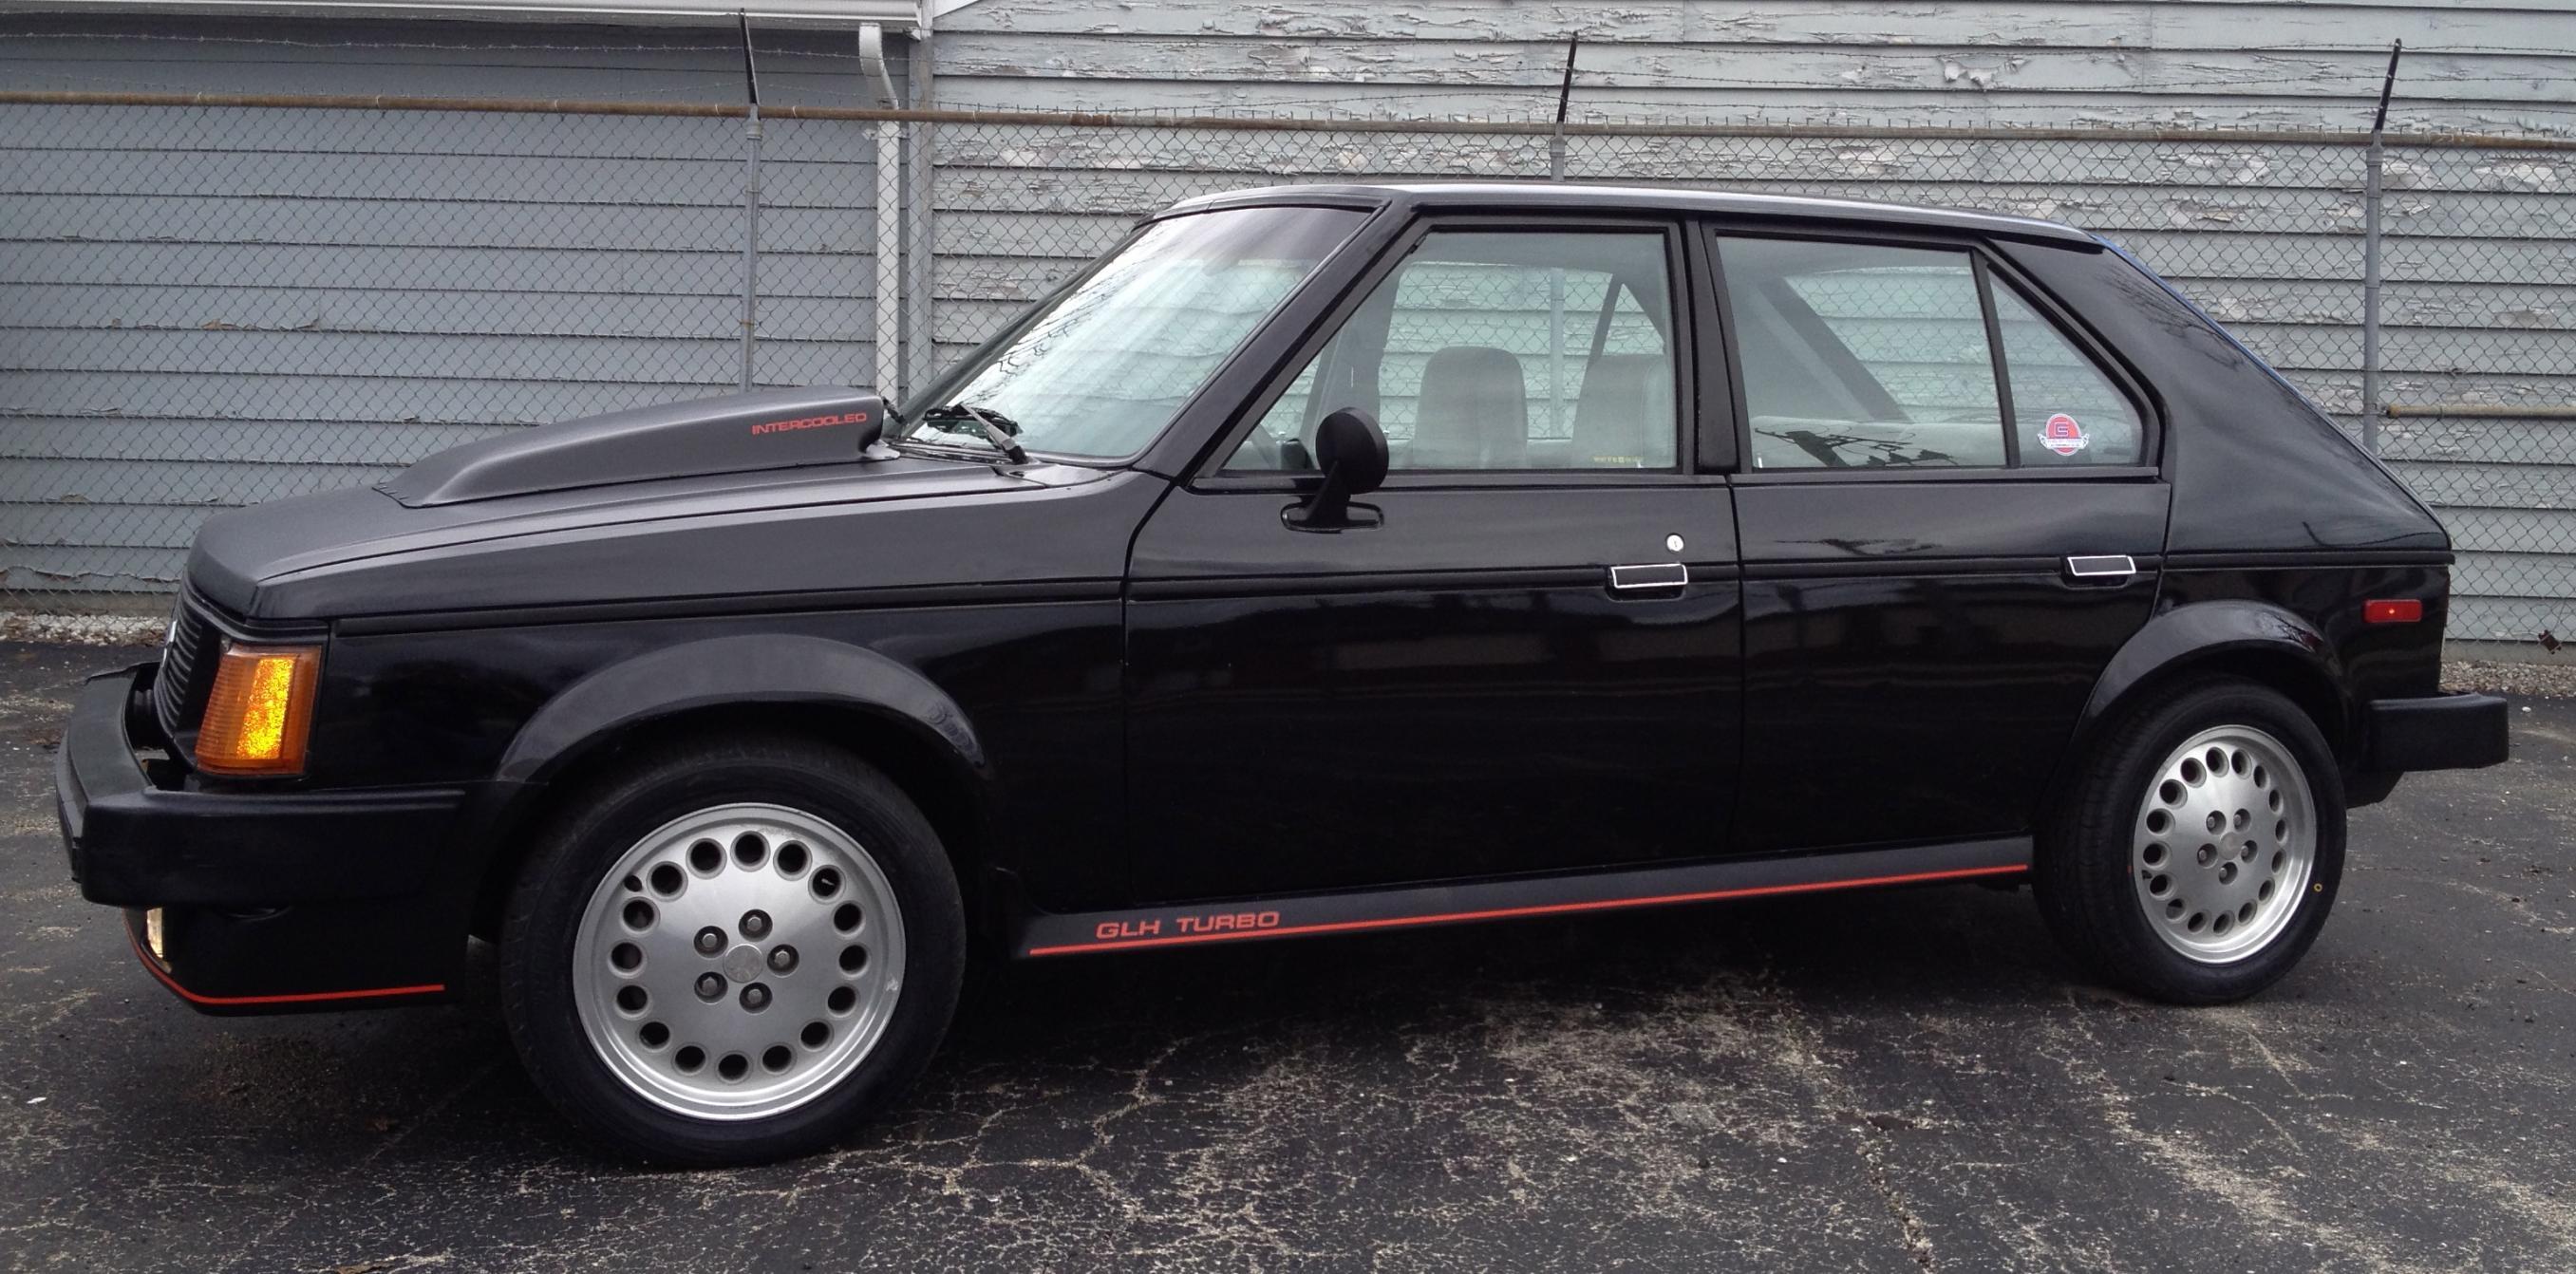 For Sale 1986 Dodge Omni Glh Turbo